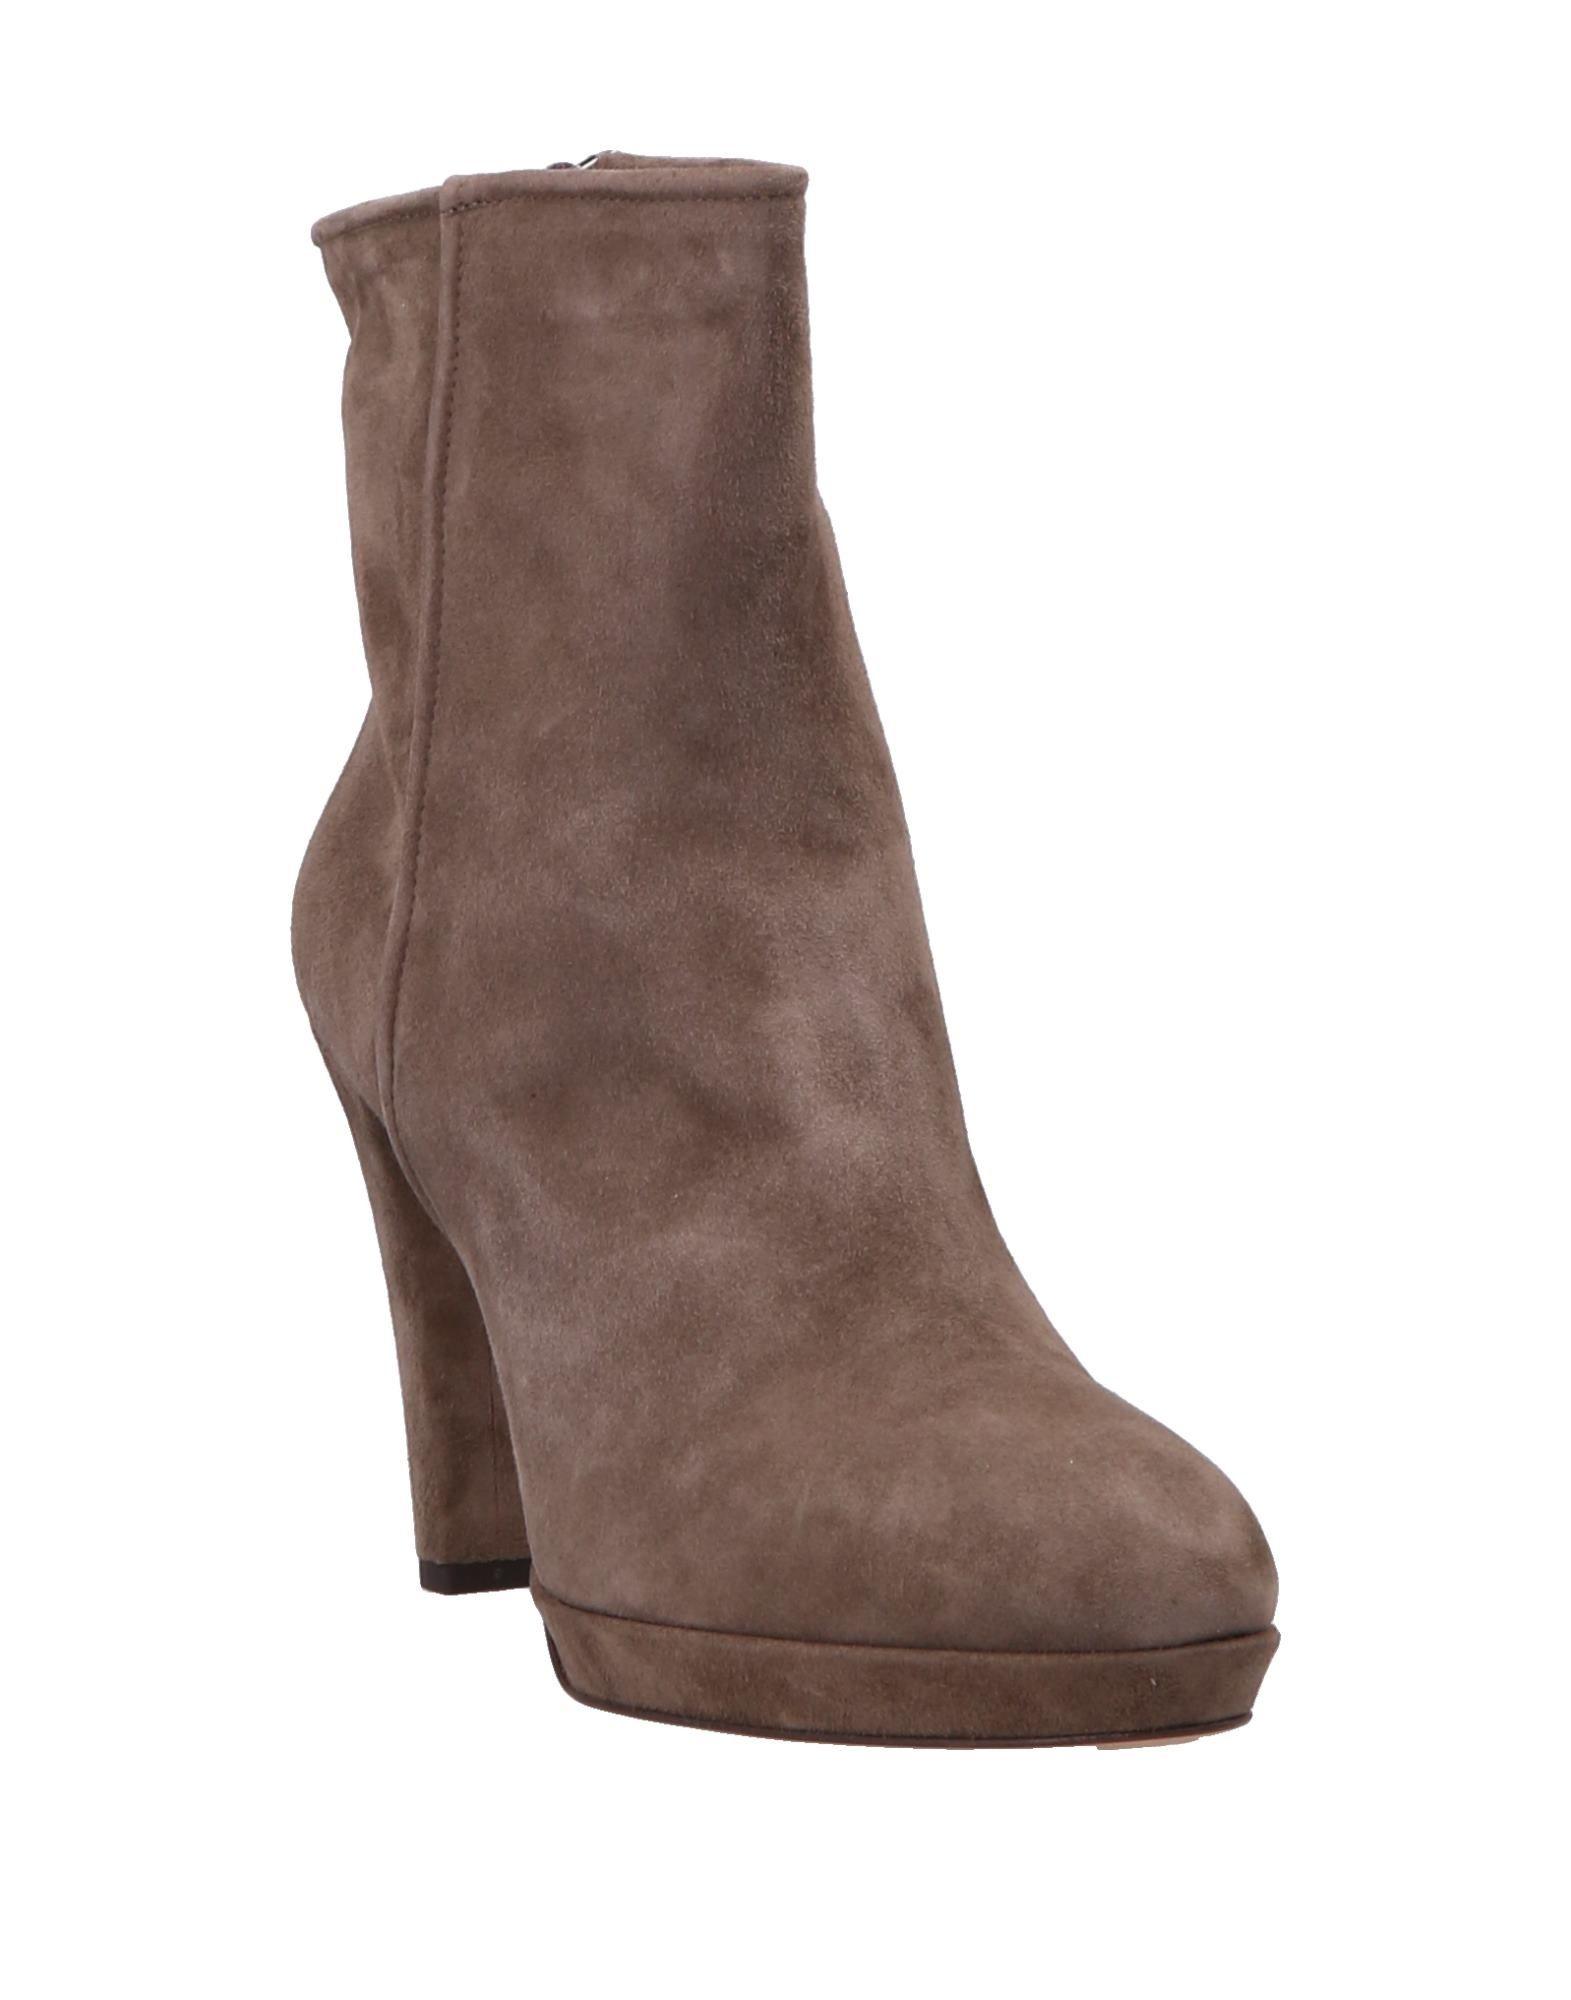 Pomme 11549387ITGut D'or Stiefelette Damen  11549387ITGut Pomme aussehende strapazierfähige Schuhe 358766